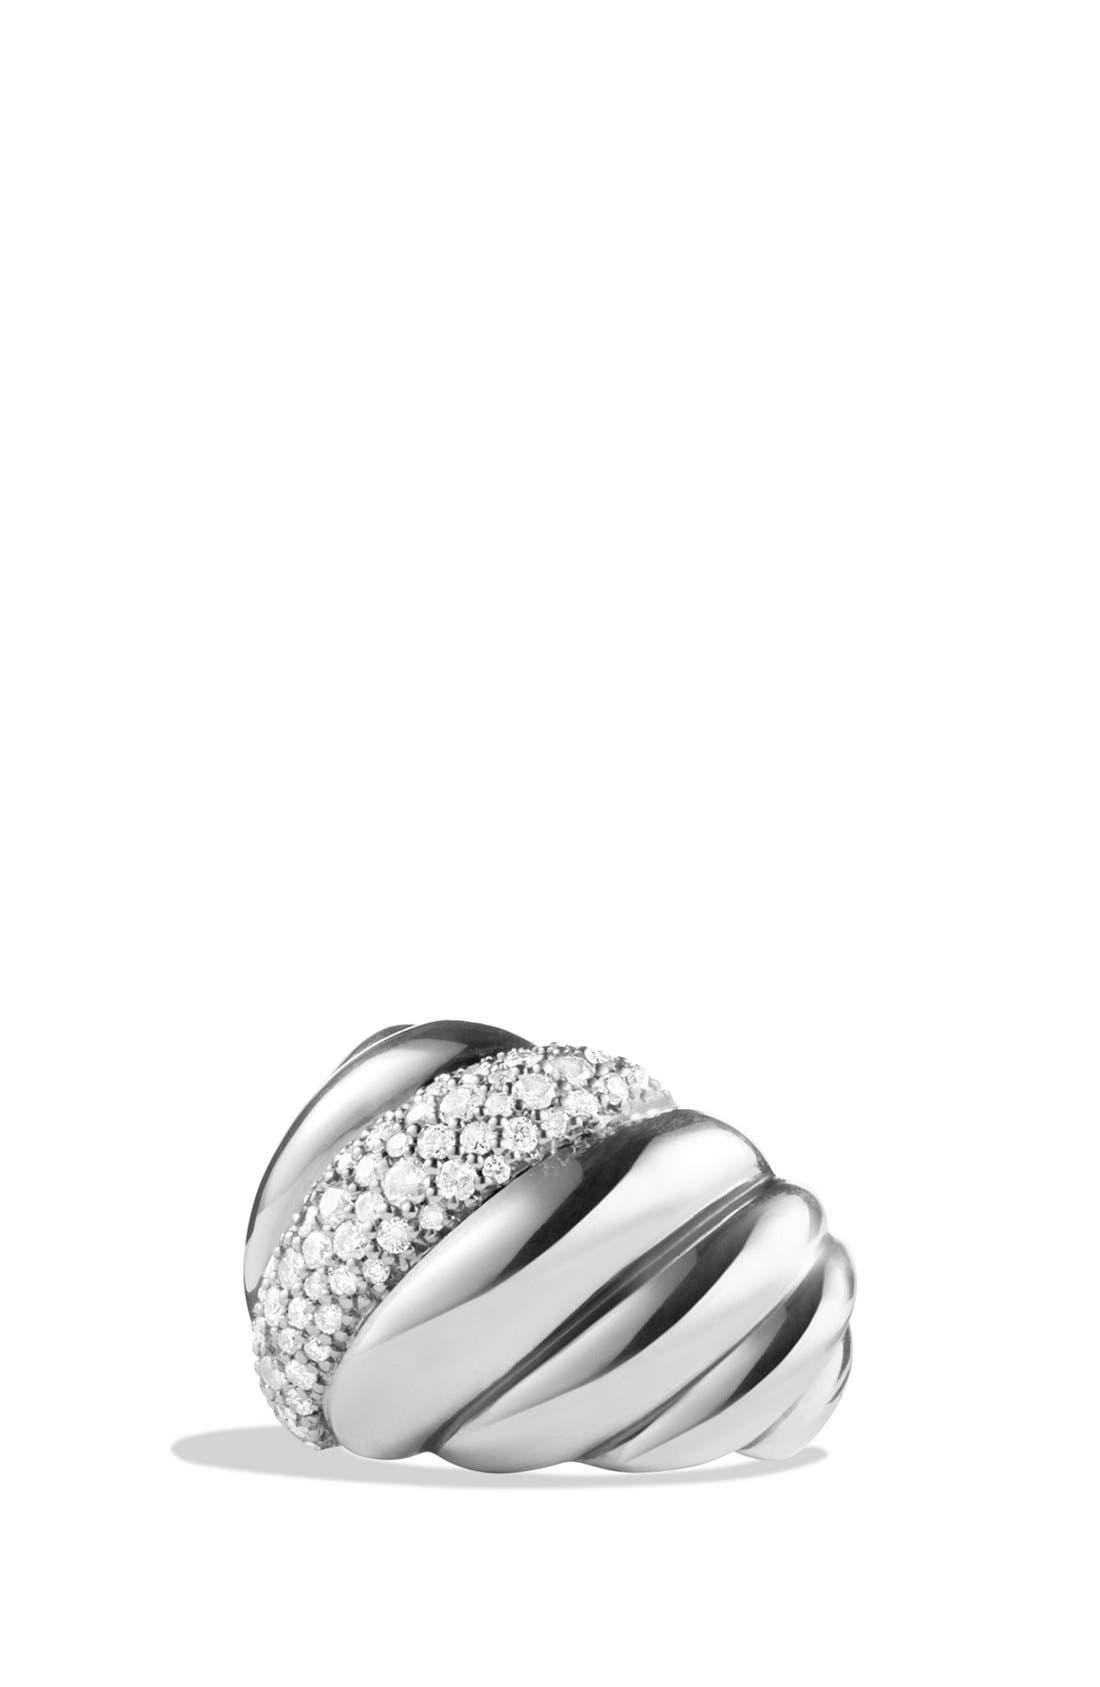 'Hampton Cable' Ring with Diamonds,                             Main thumbnail 1, color,                             041